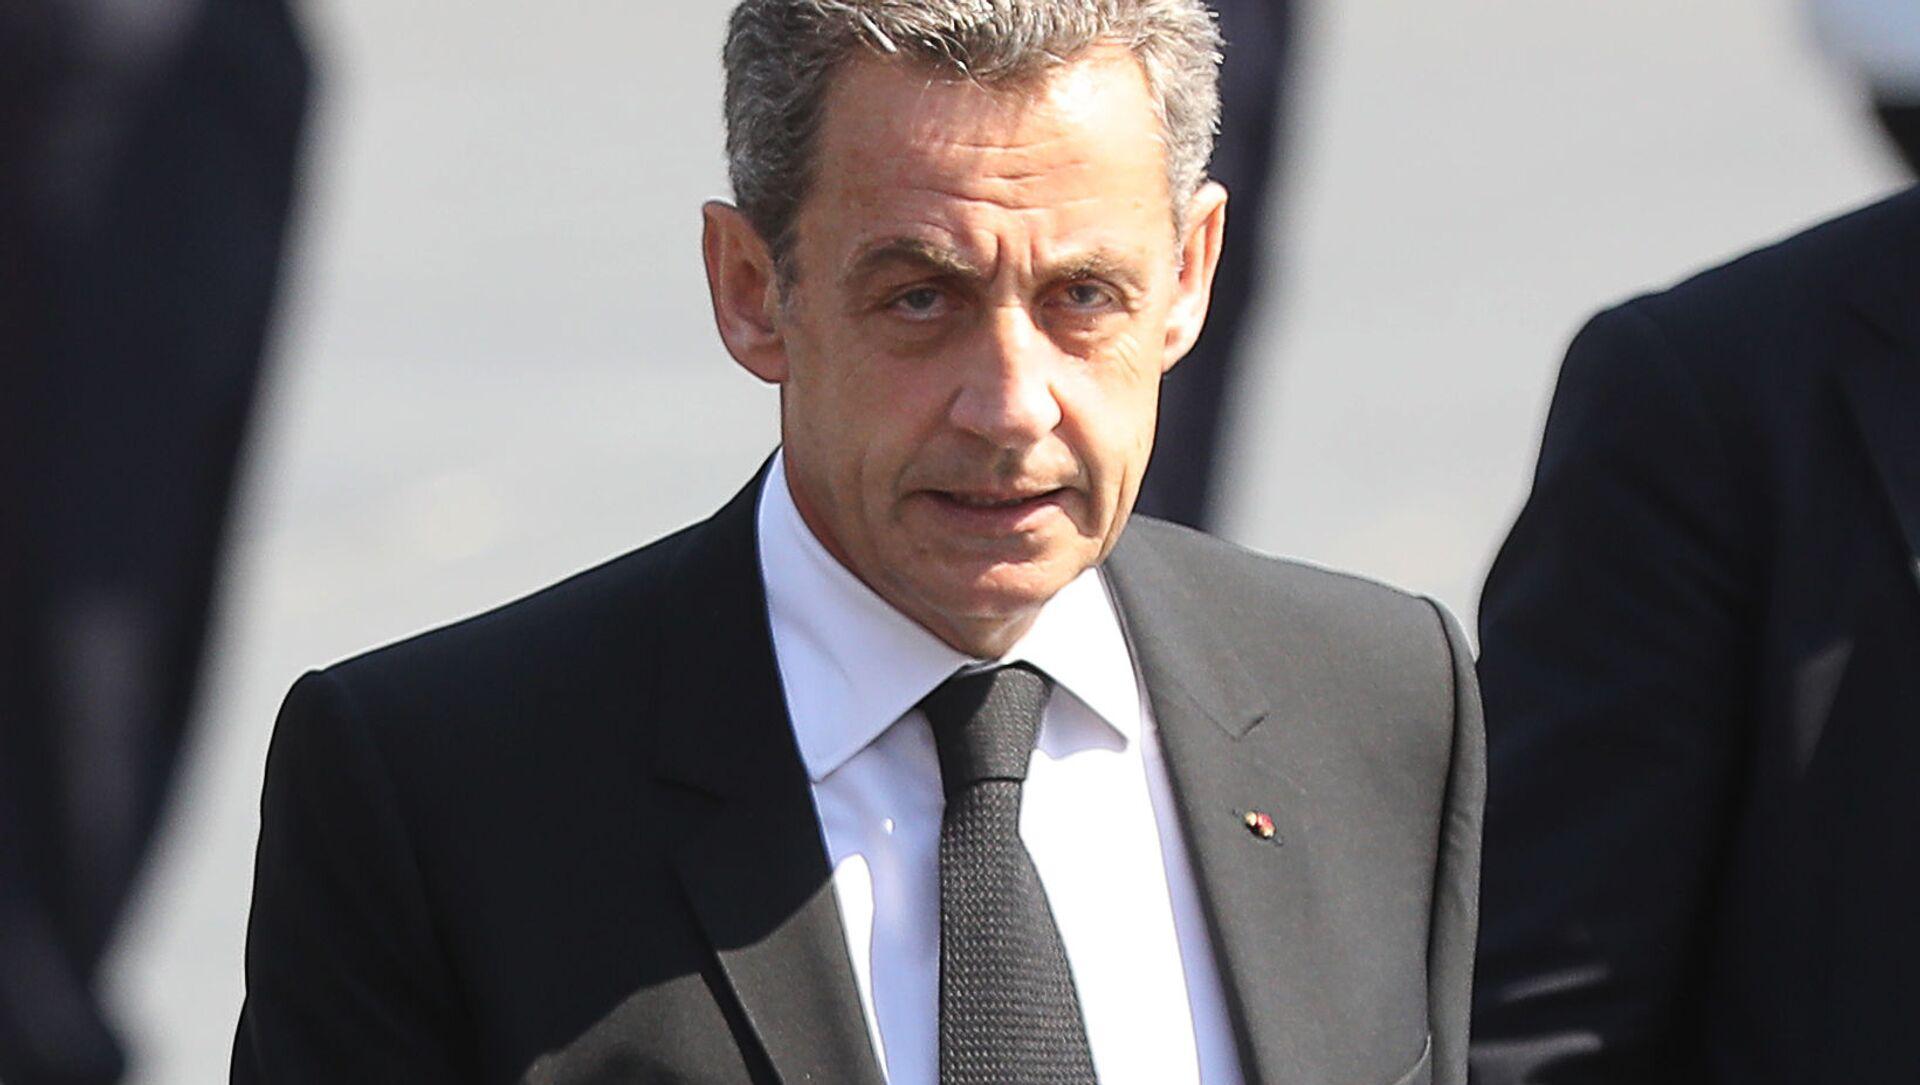 Bývalý francouzský prezident Nicolas Sarkozy  - Sputnik Česká republika, 1920, 01.03.2021